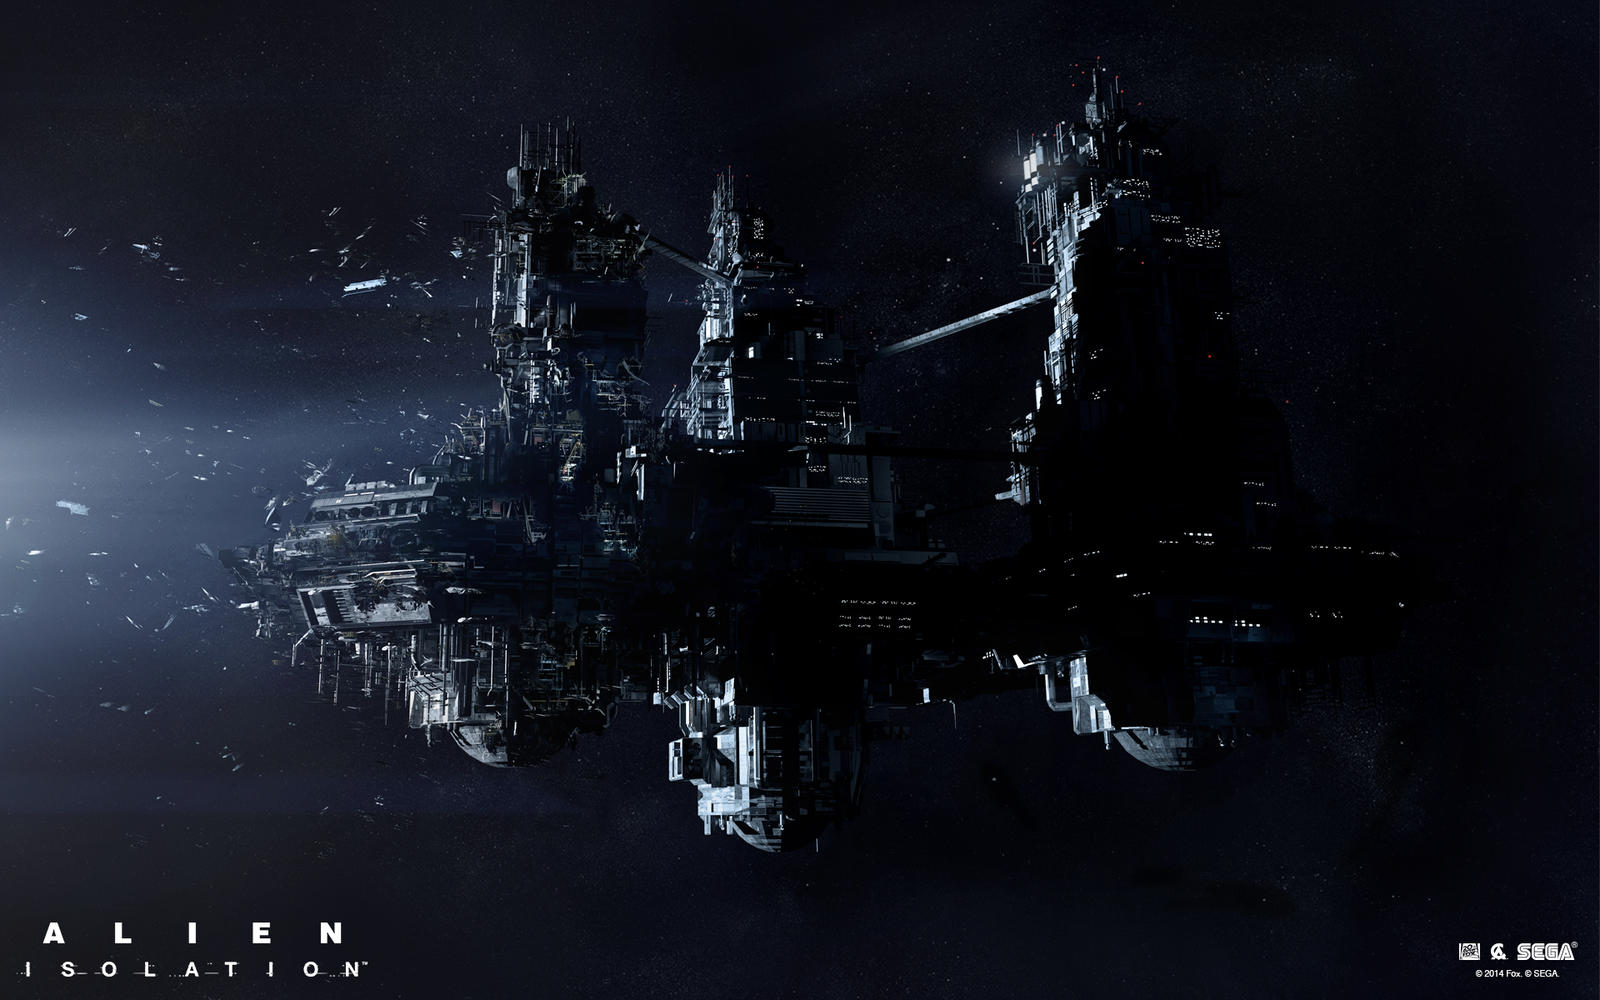 Alien Isolation marketing art by bradwright